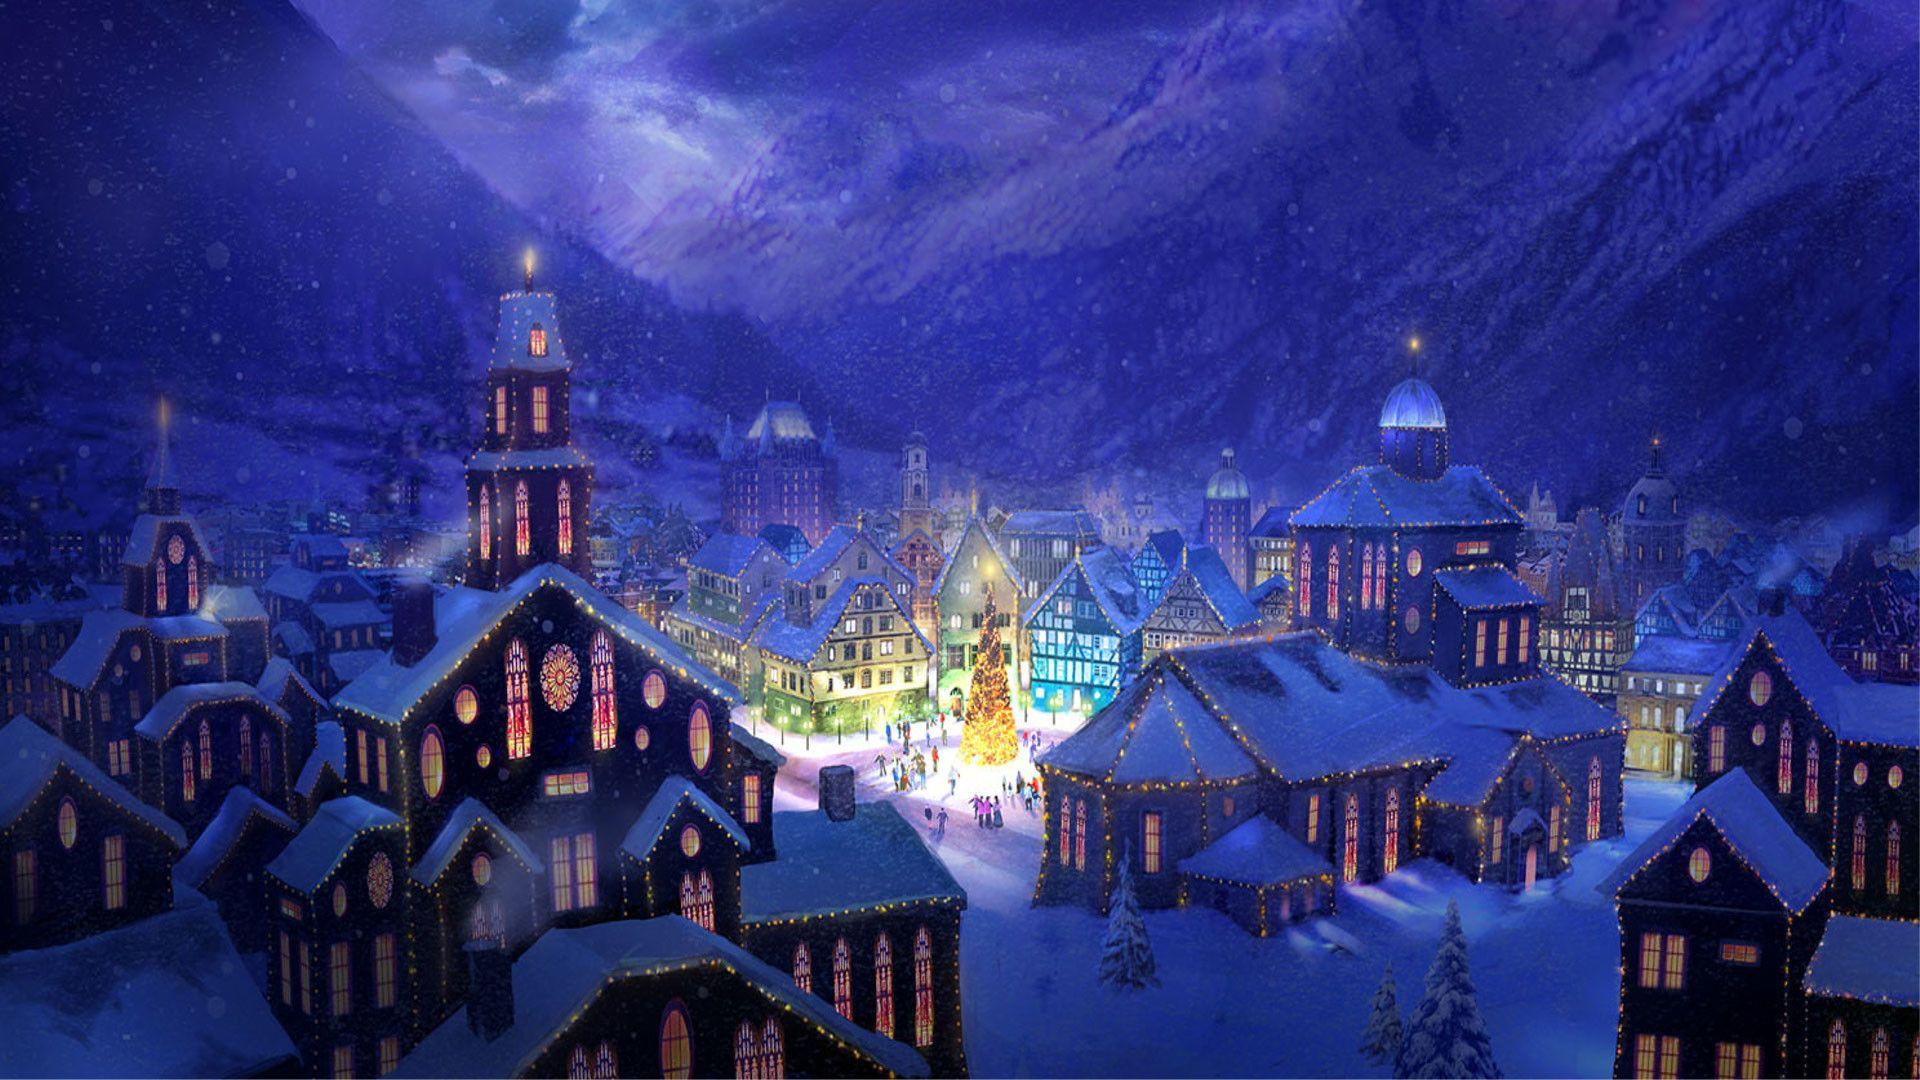 Res 1920x1080 Over 1000 Ida C Er Om Christmas Wallpaper Hd Pa Pinterest Vintage Src Christmas Wallpaper Hd Christmas Landscape Christmas Town